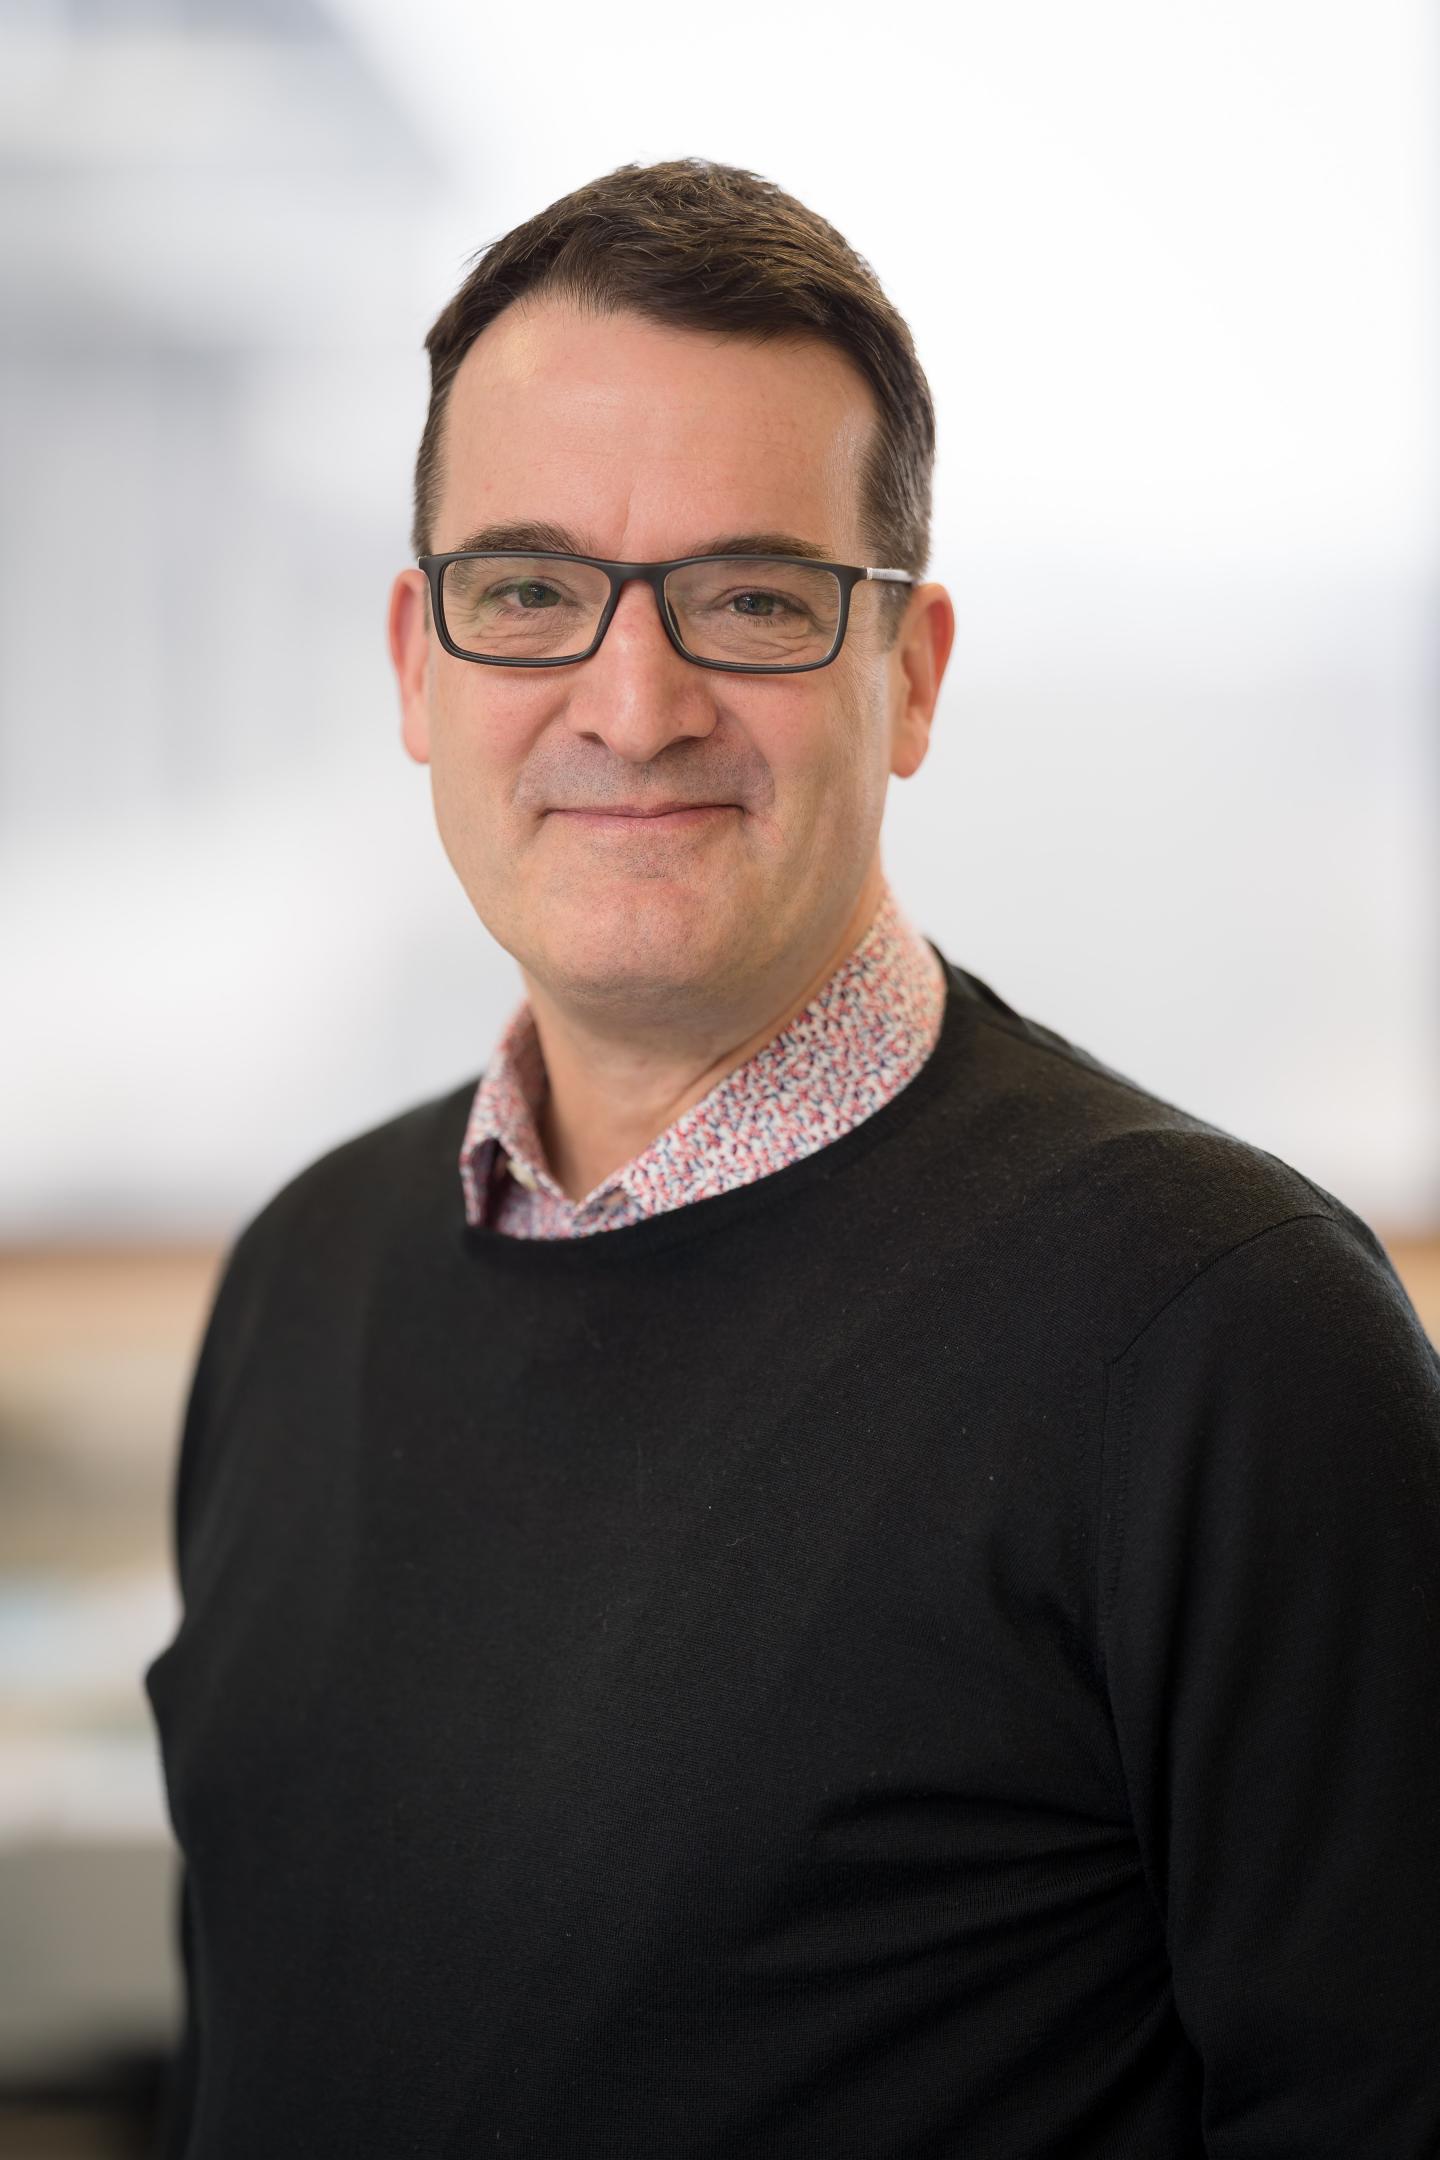 Professor Rob Taylor, Newcastle University, UK